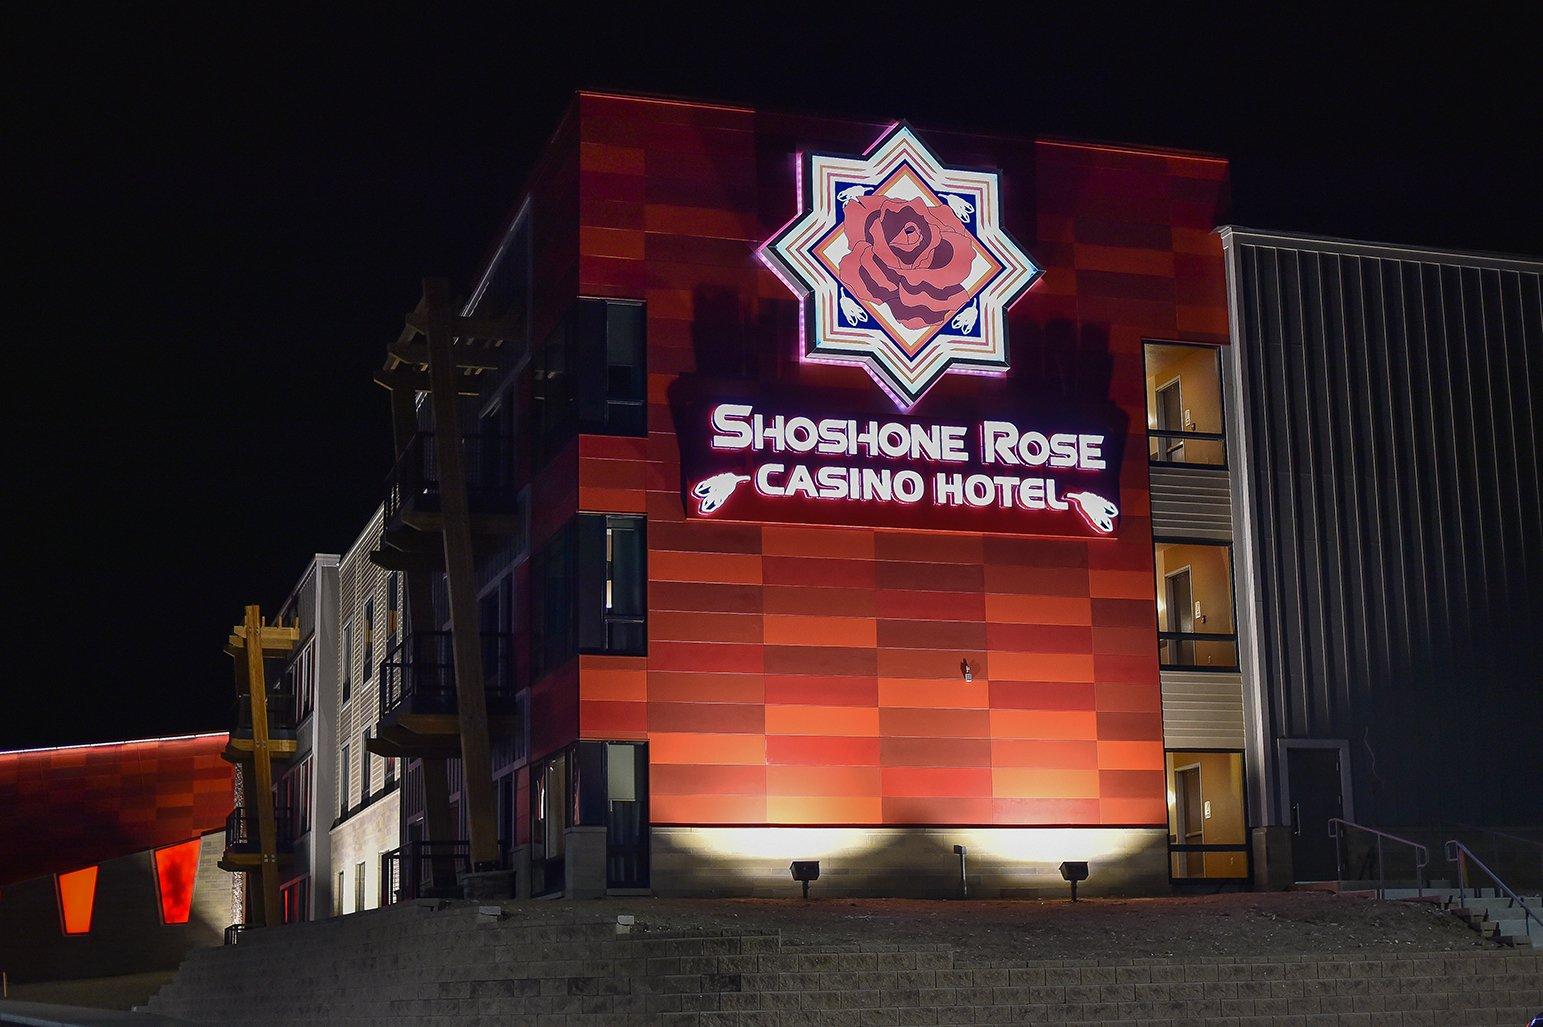 Shoshone rose casino lander